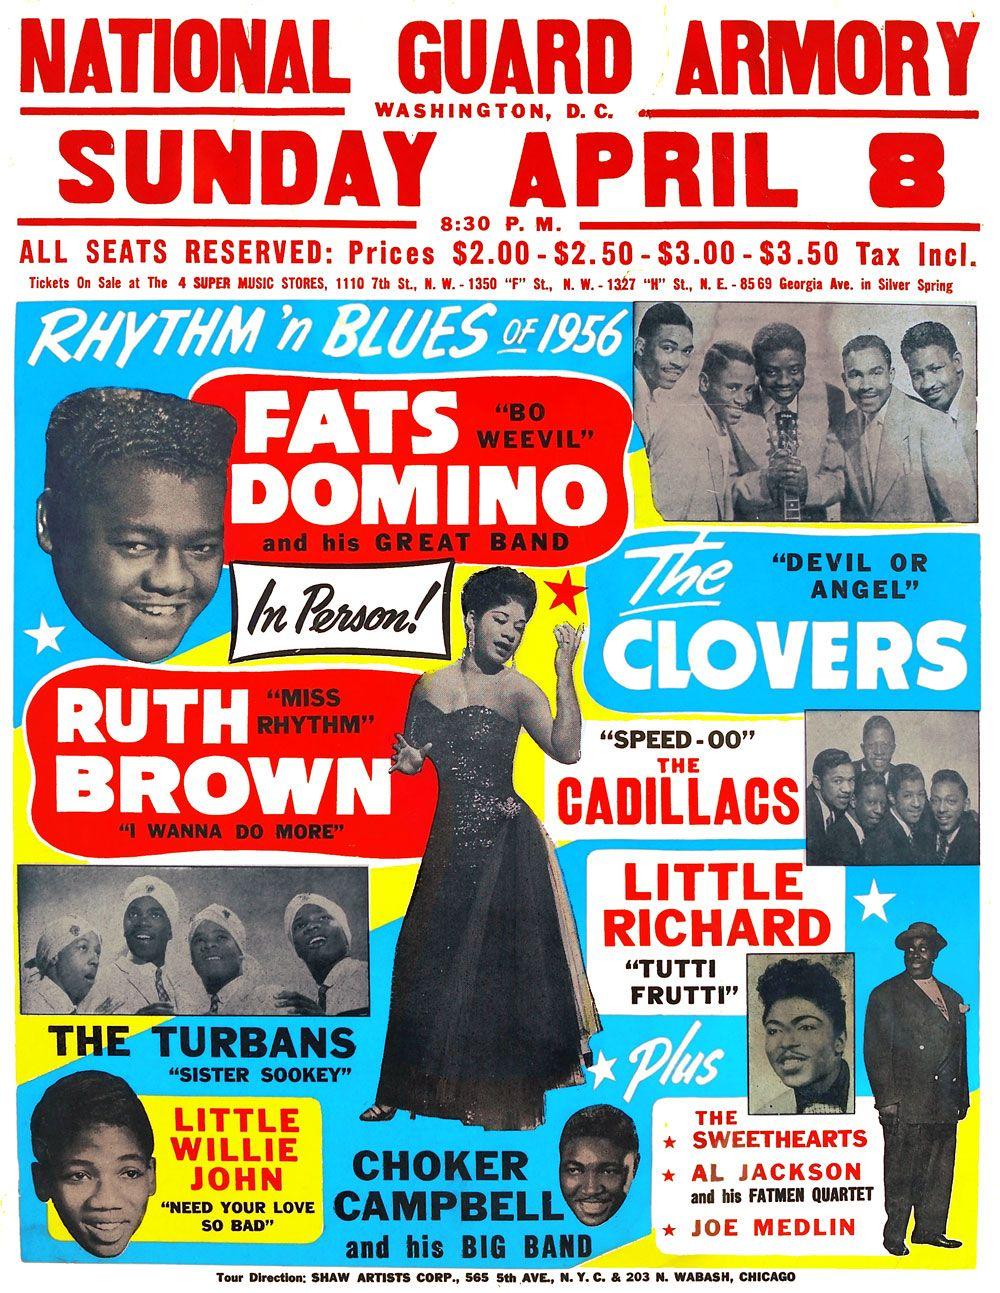 Fats Domino poster - Washington - 1956